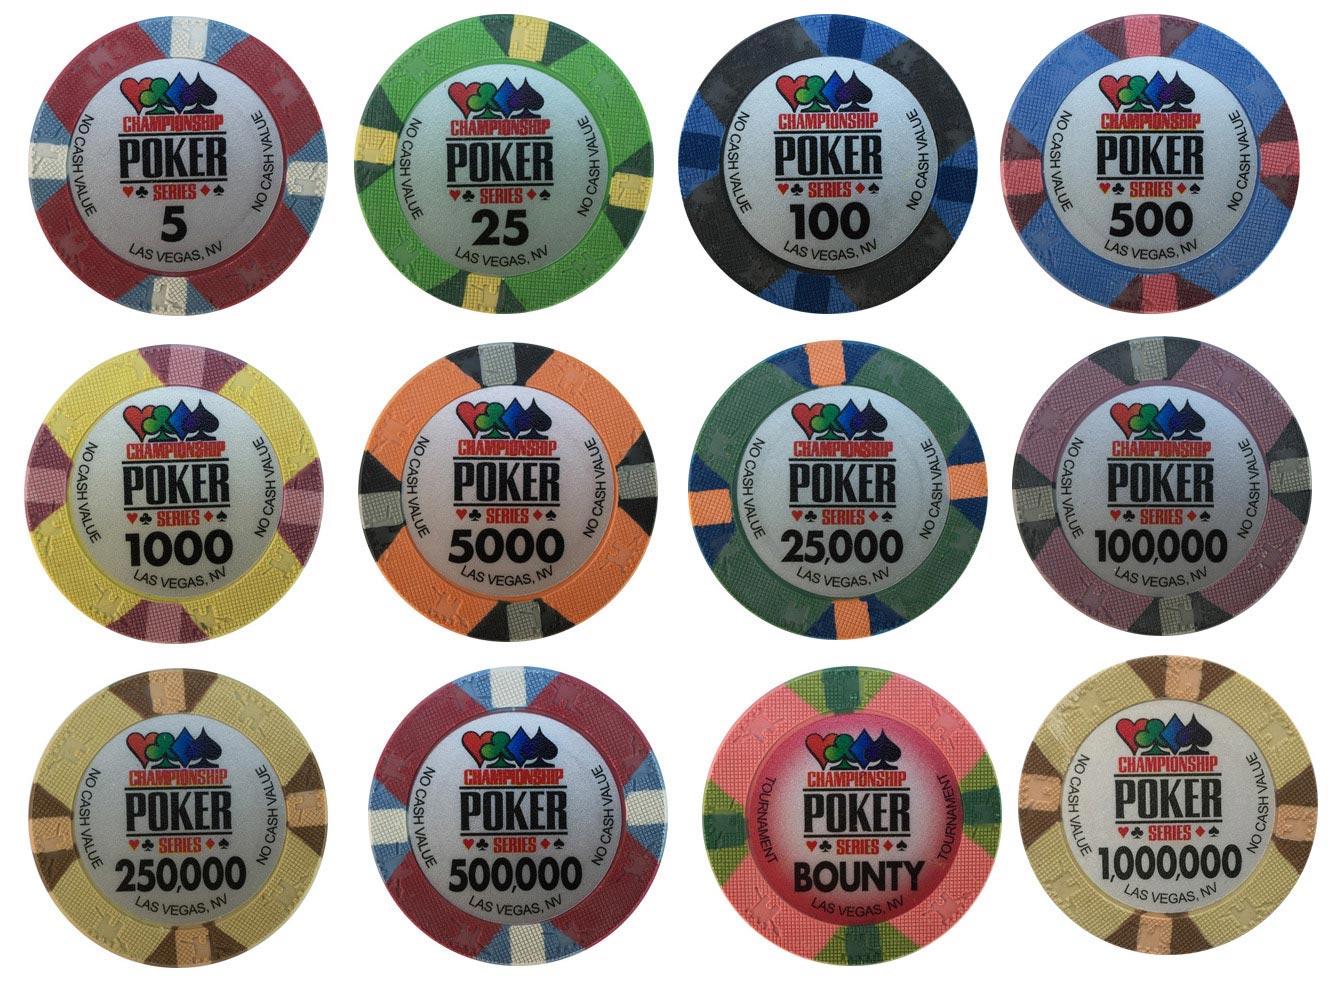 cps-tournament-poker-chips-set.jpg?fit=1334%2C988&ssl=1